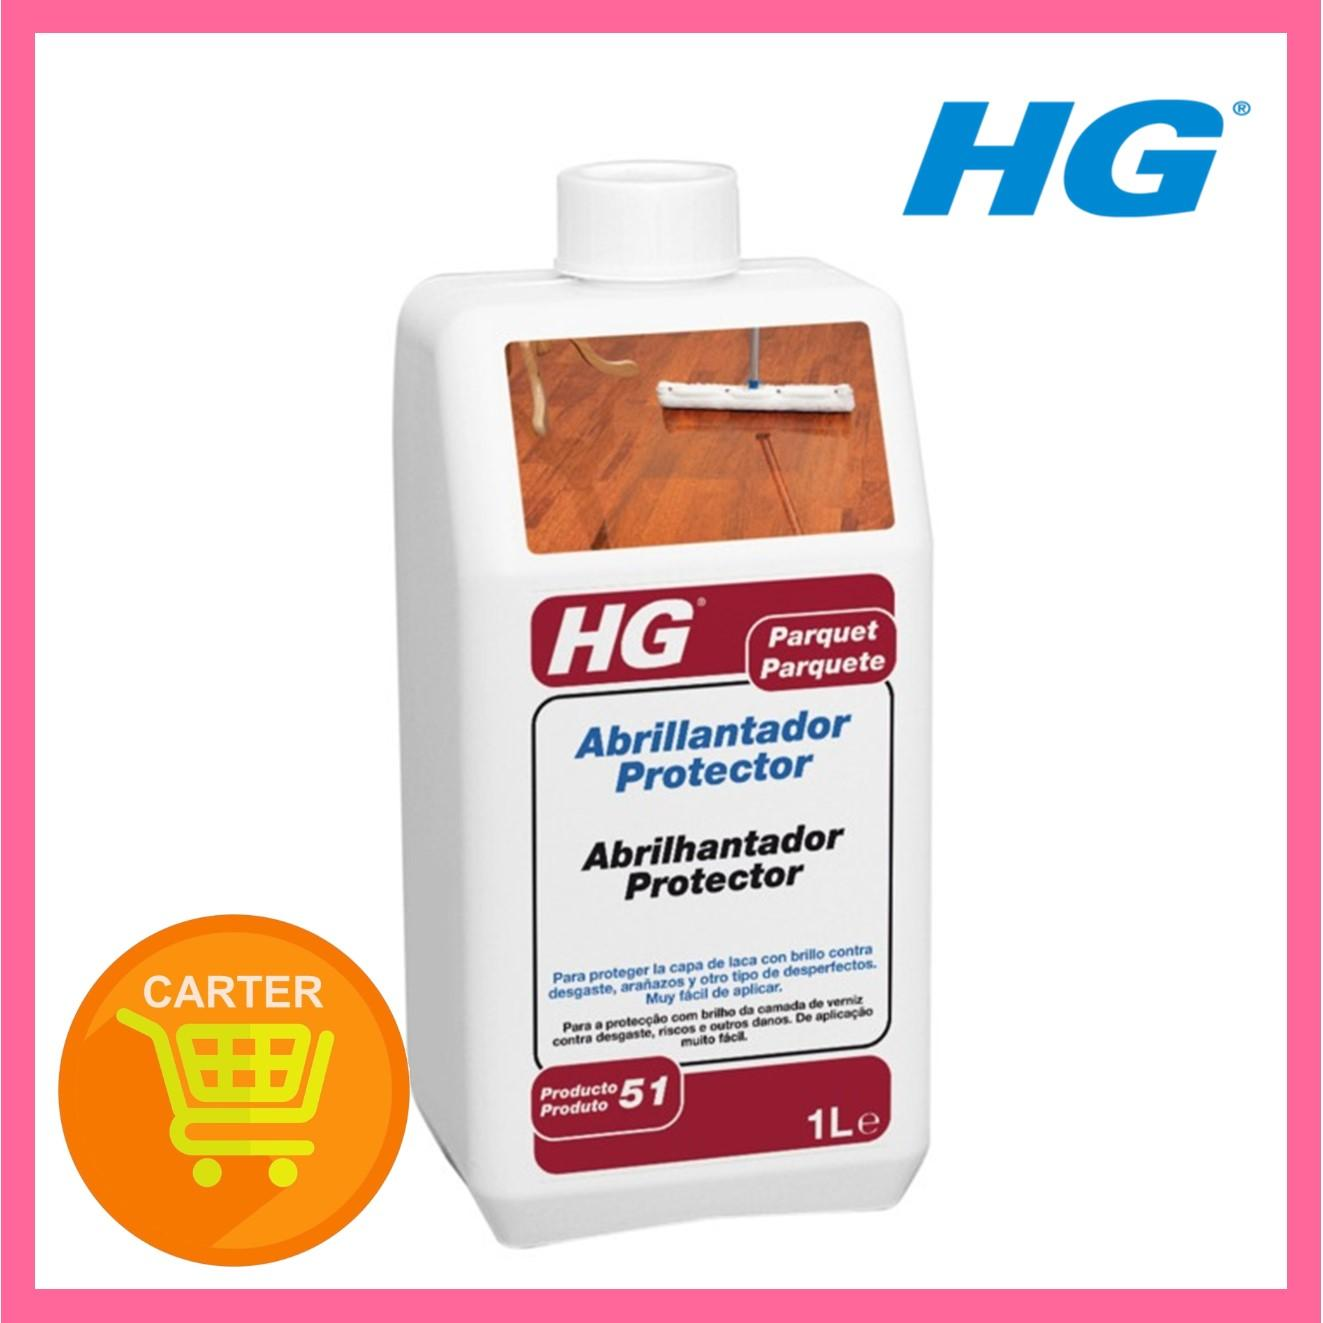 HG PARQUET P.E POLISH PROTECTIVE COATING 1L - HG200